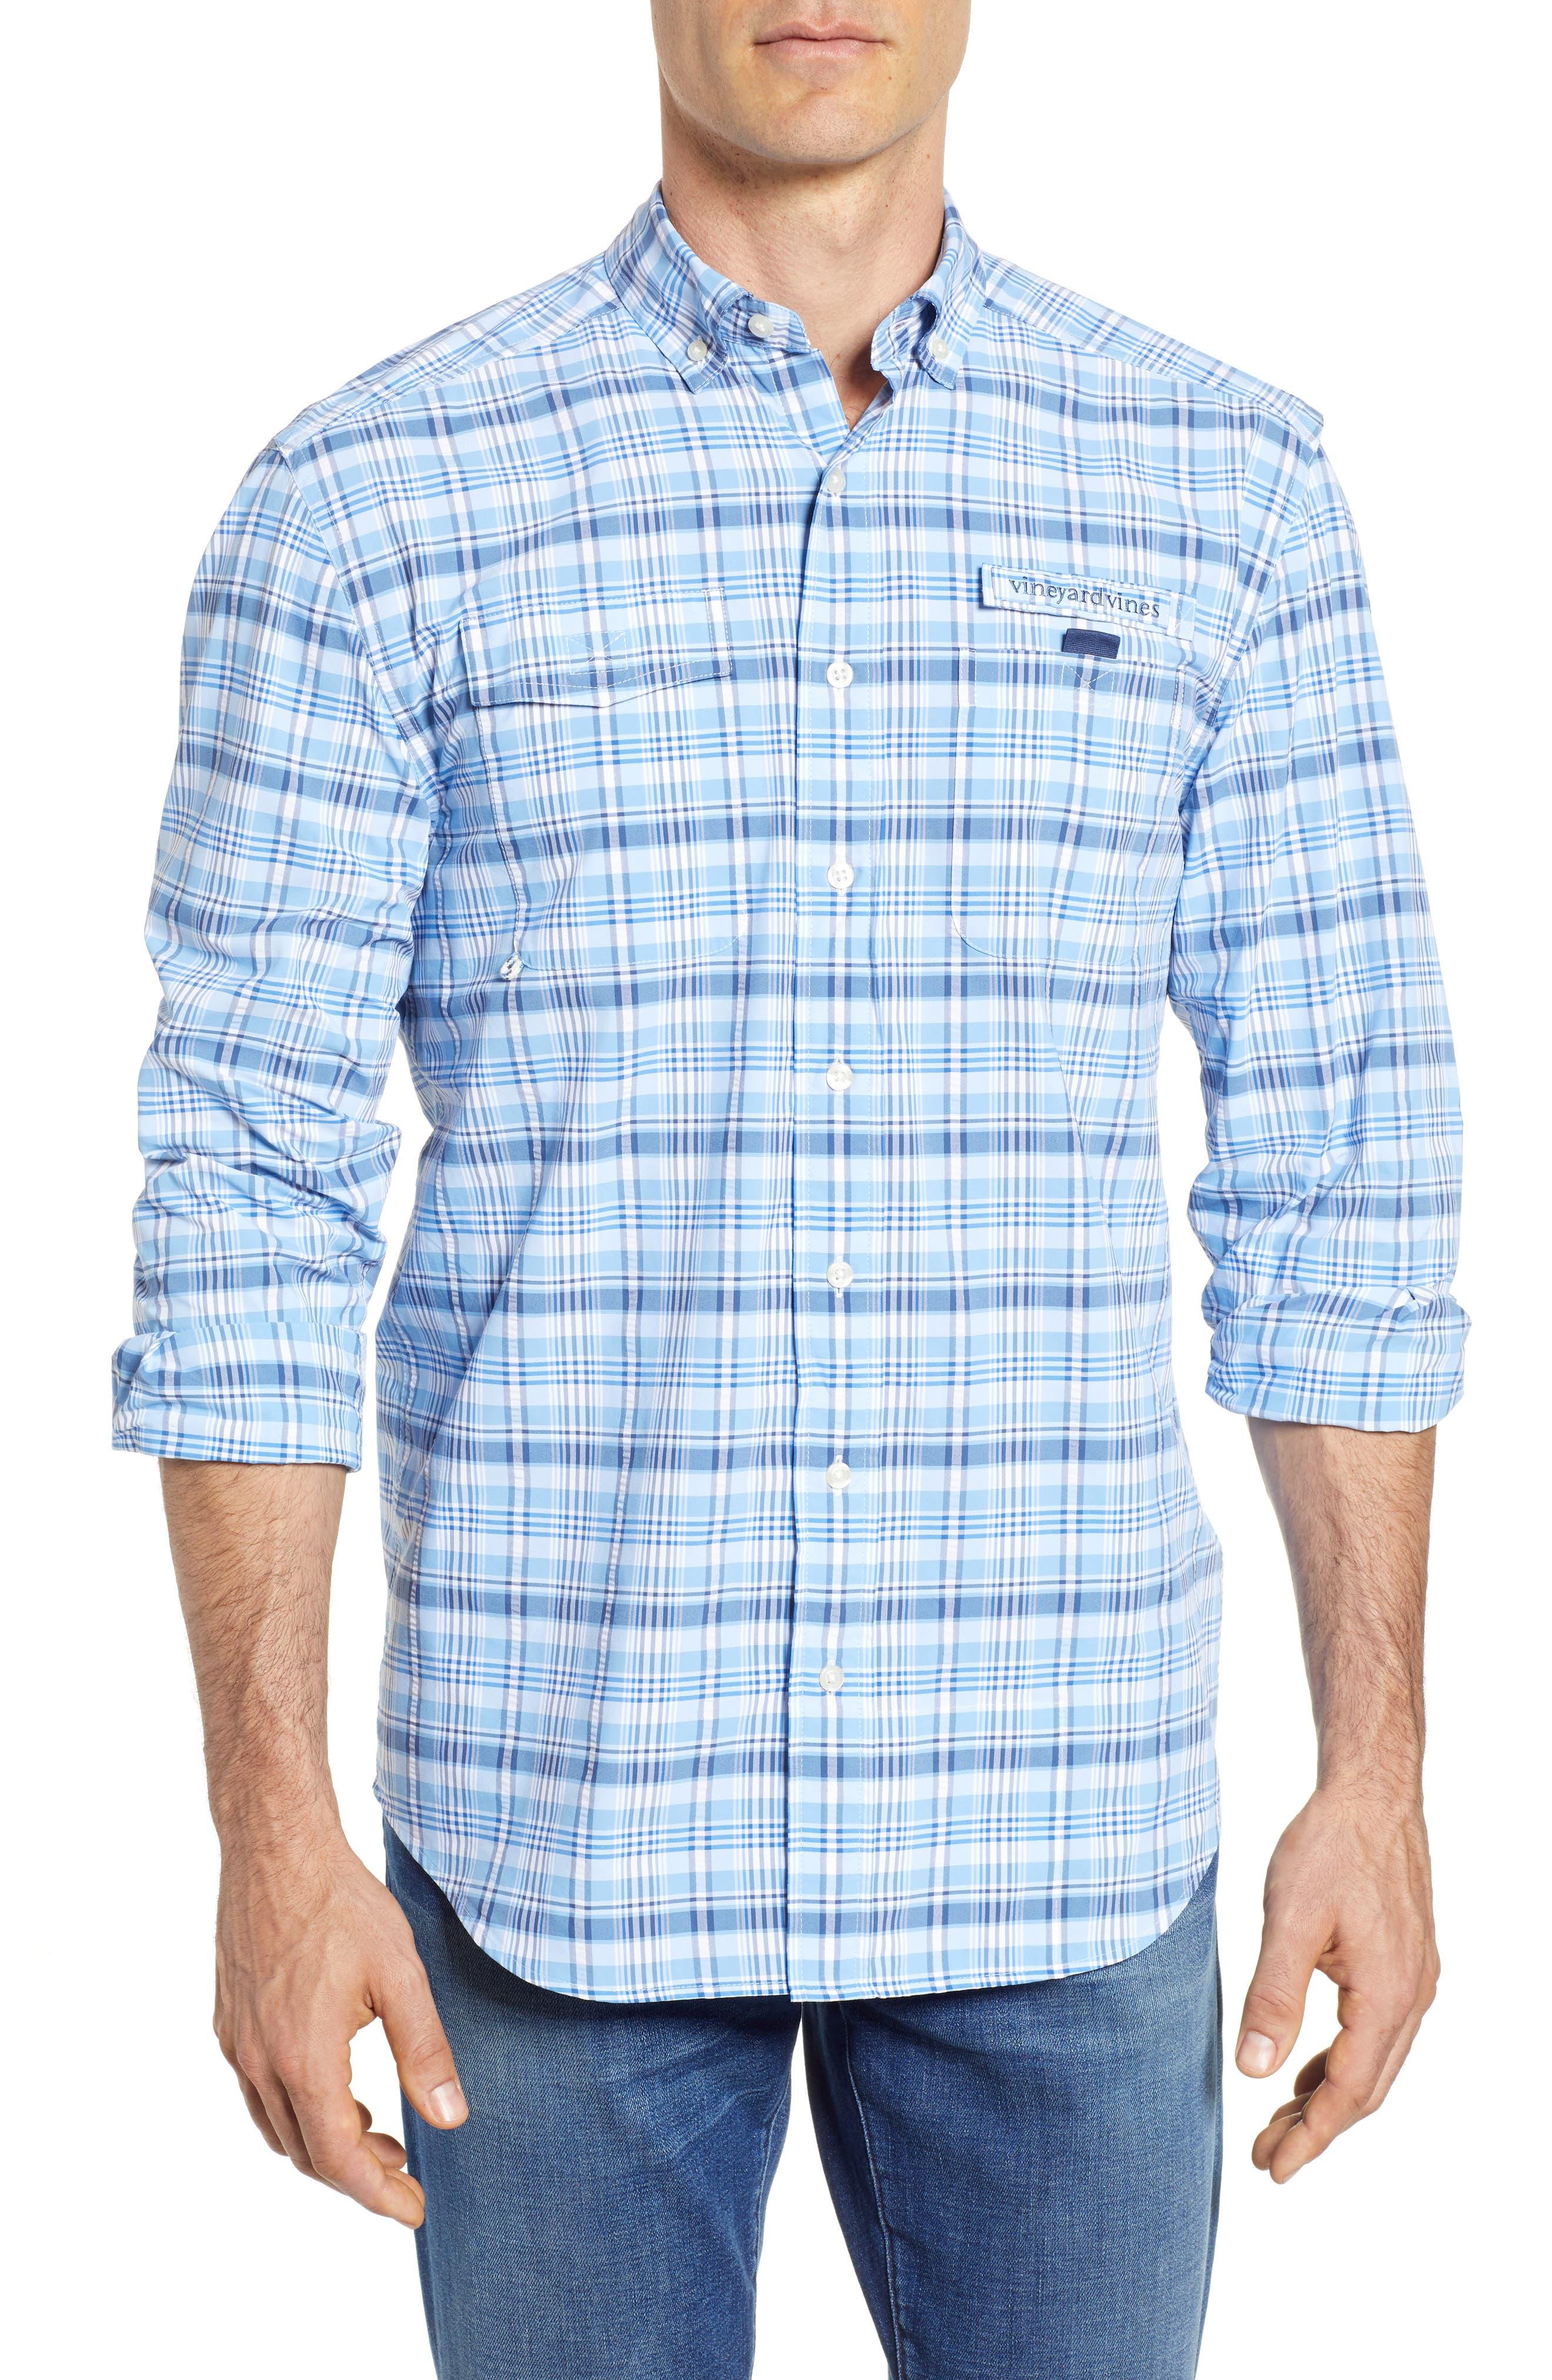 Prospect Hill Harbor Regular Fit Plaid Performance Sport Shirt,                             Main thumbnail 1, color,                             484